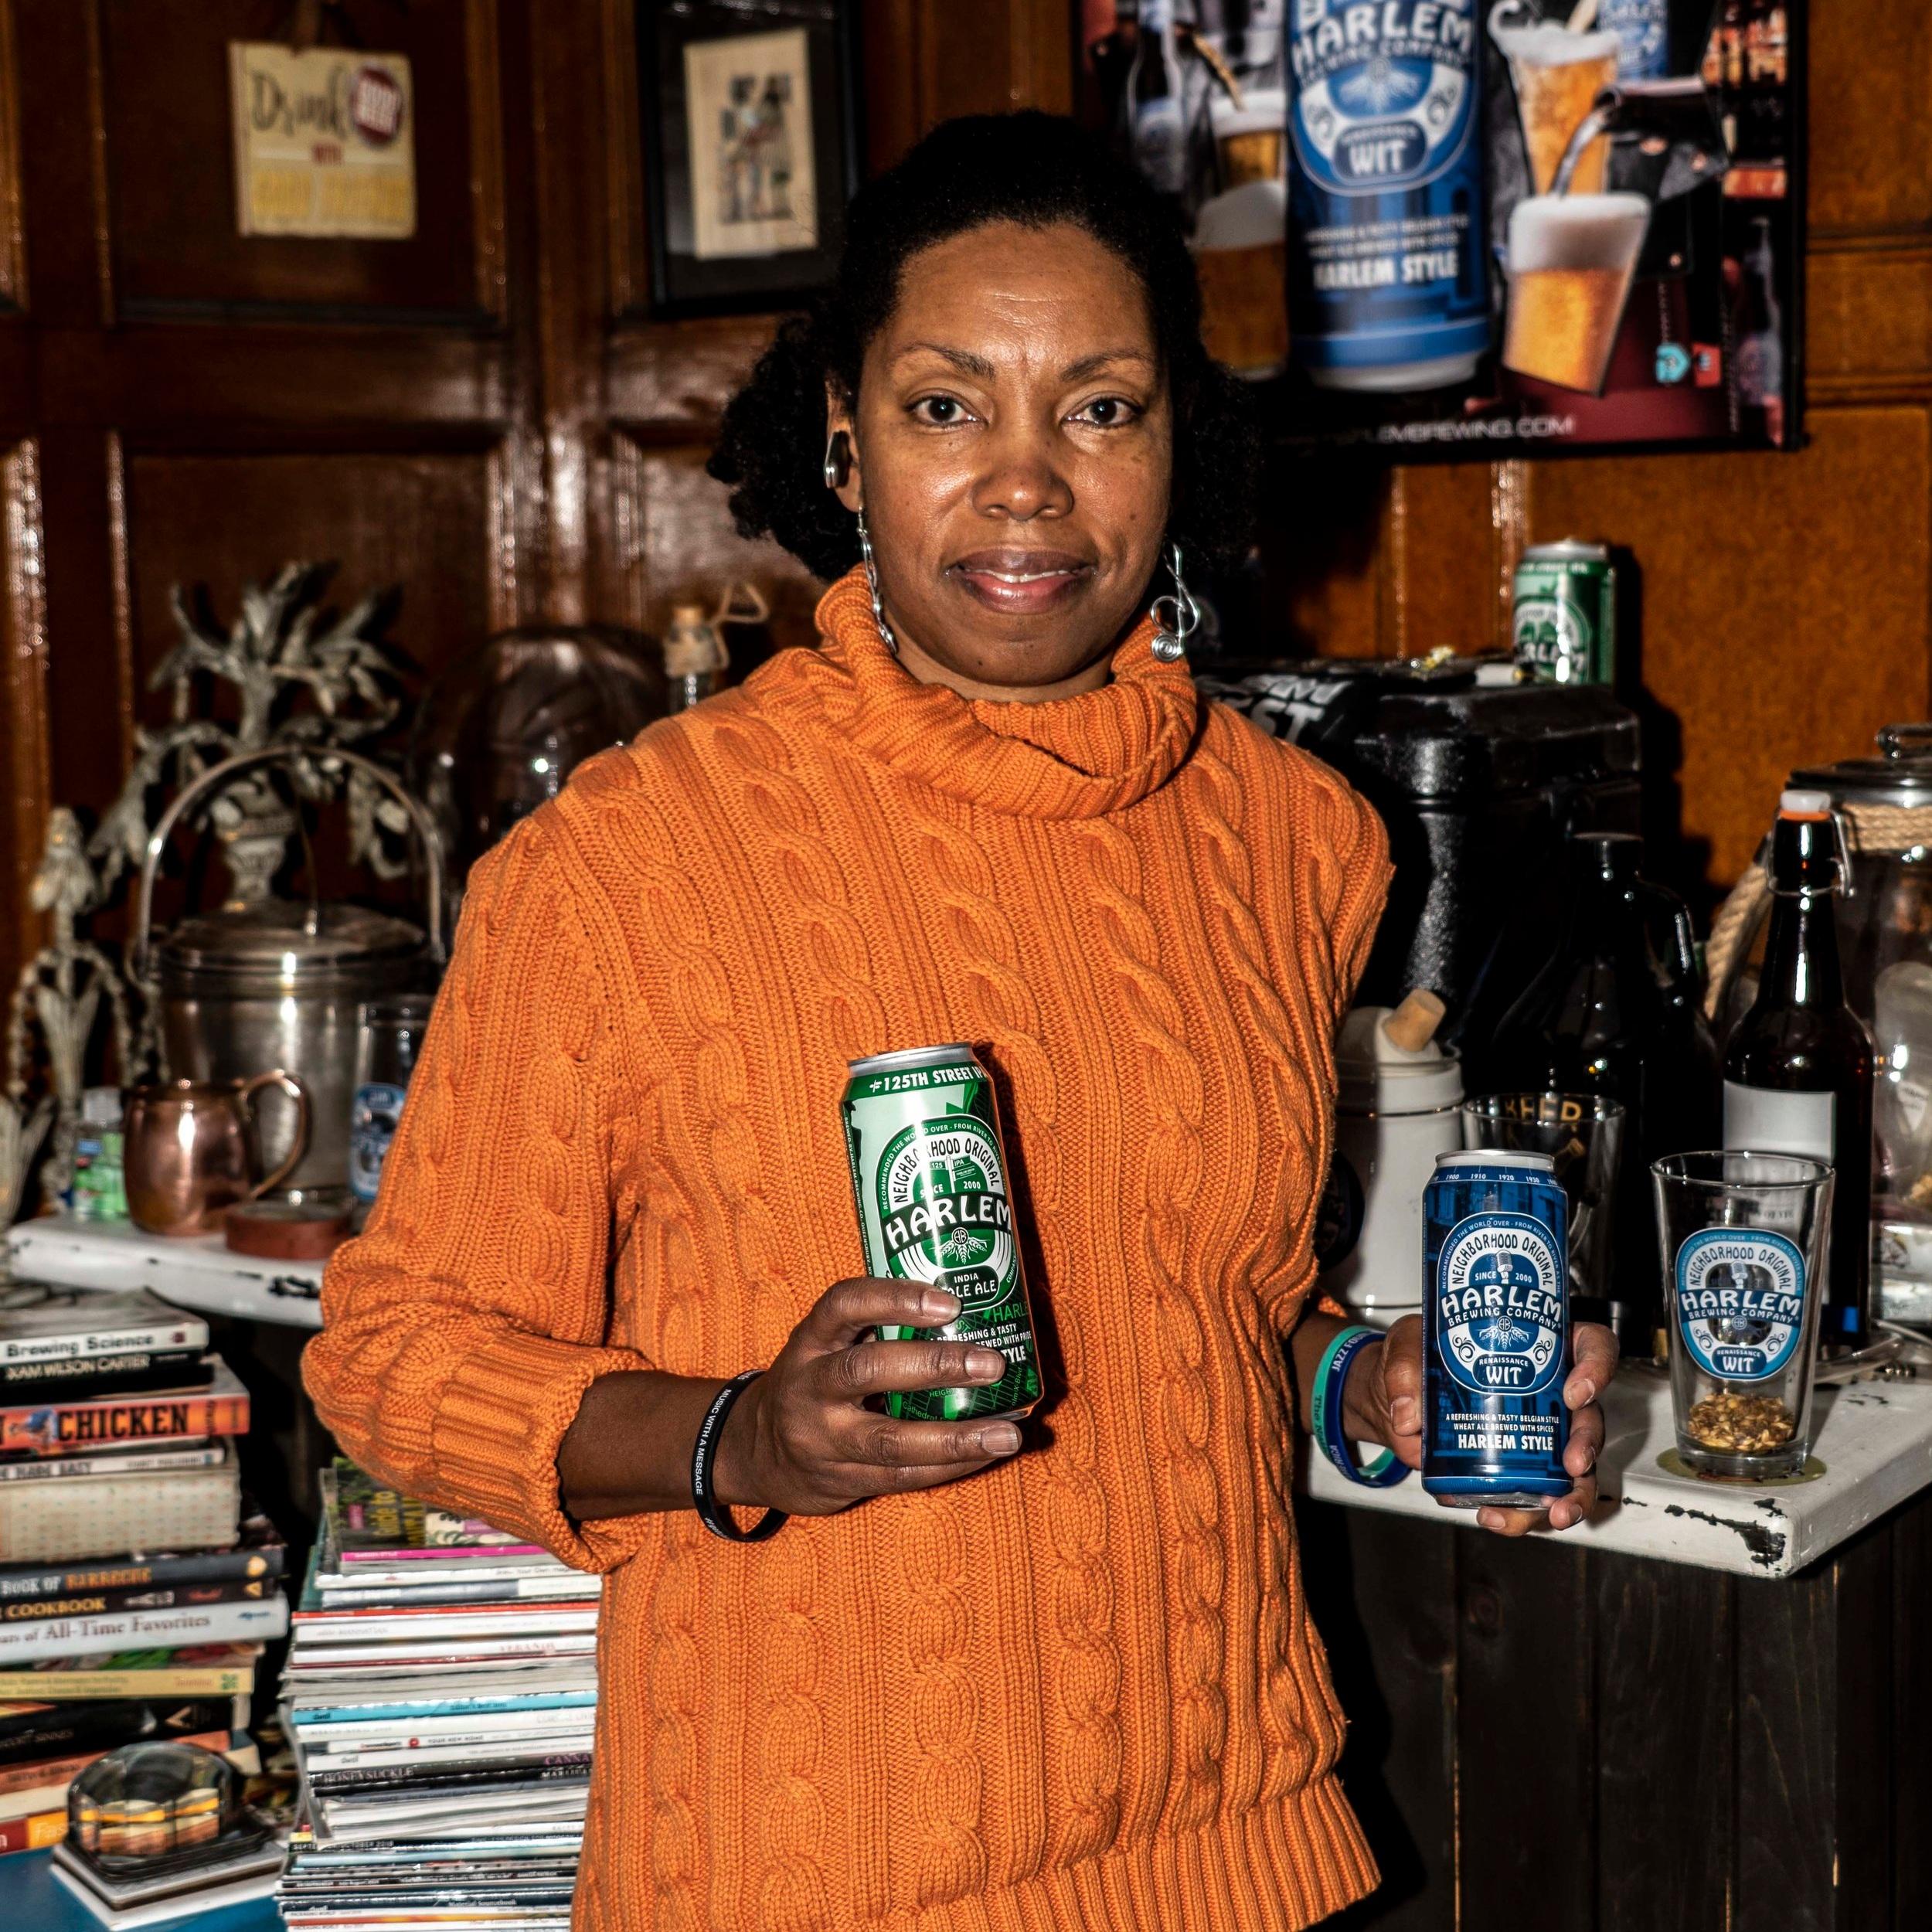 Celeste of Harlem Brewing Company (NY)